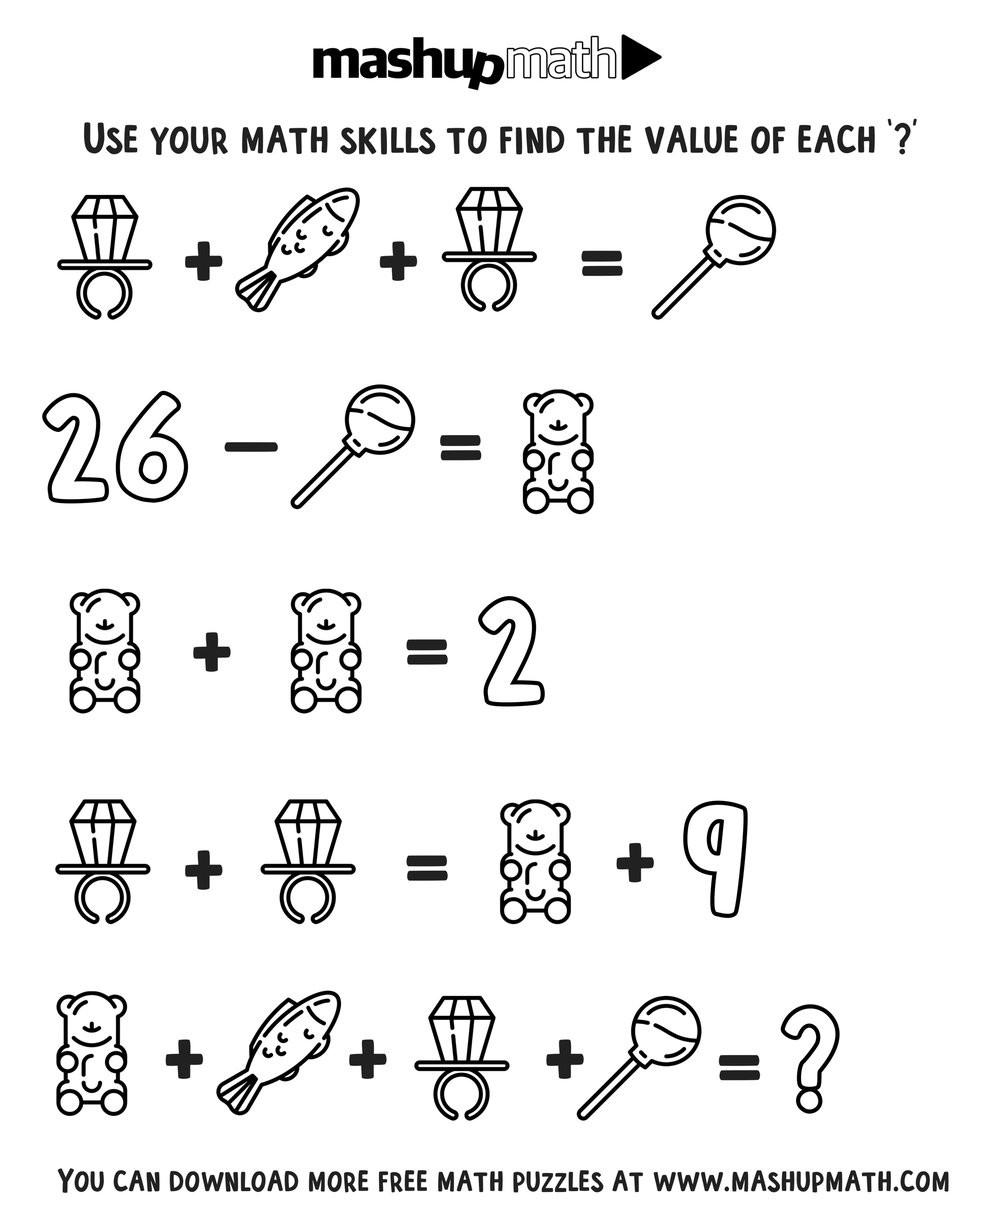 2nd Grade Math Challenge Worksheets Free Math Coloring Worksheets for Grades 1 8 — Mashup Math